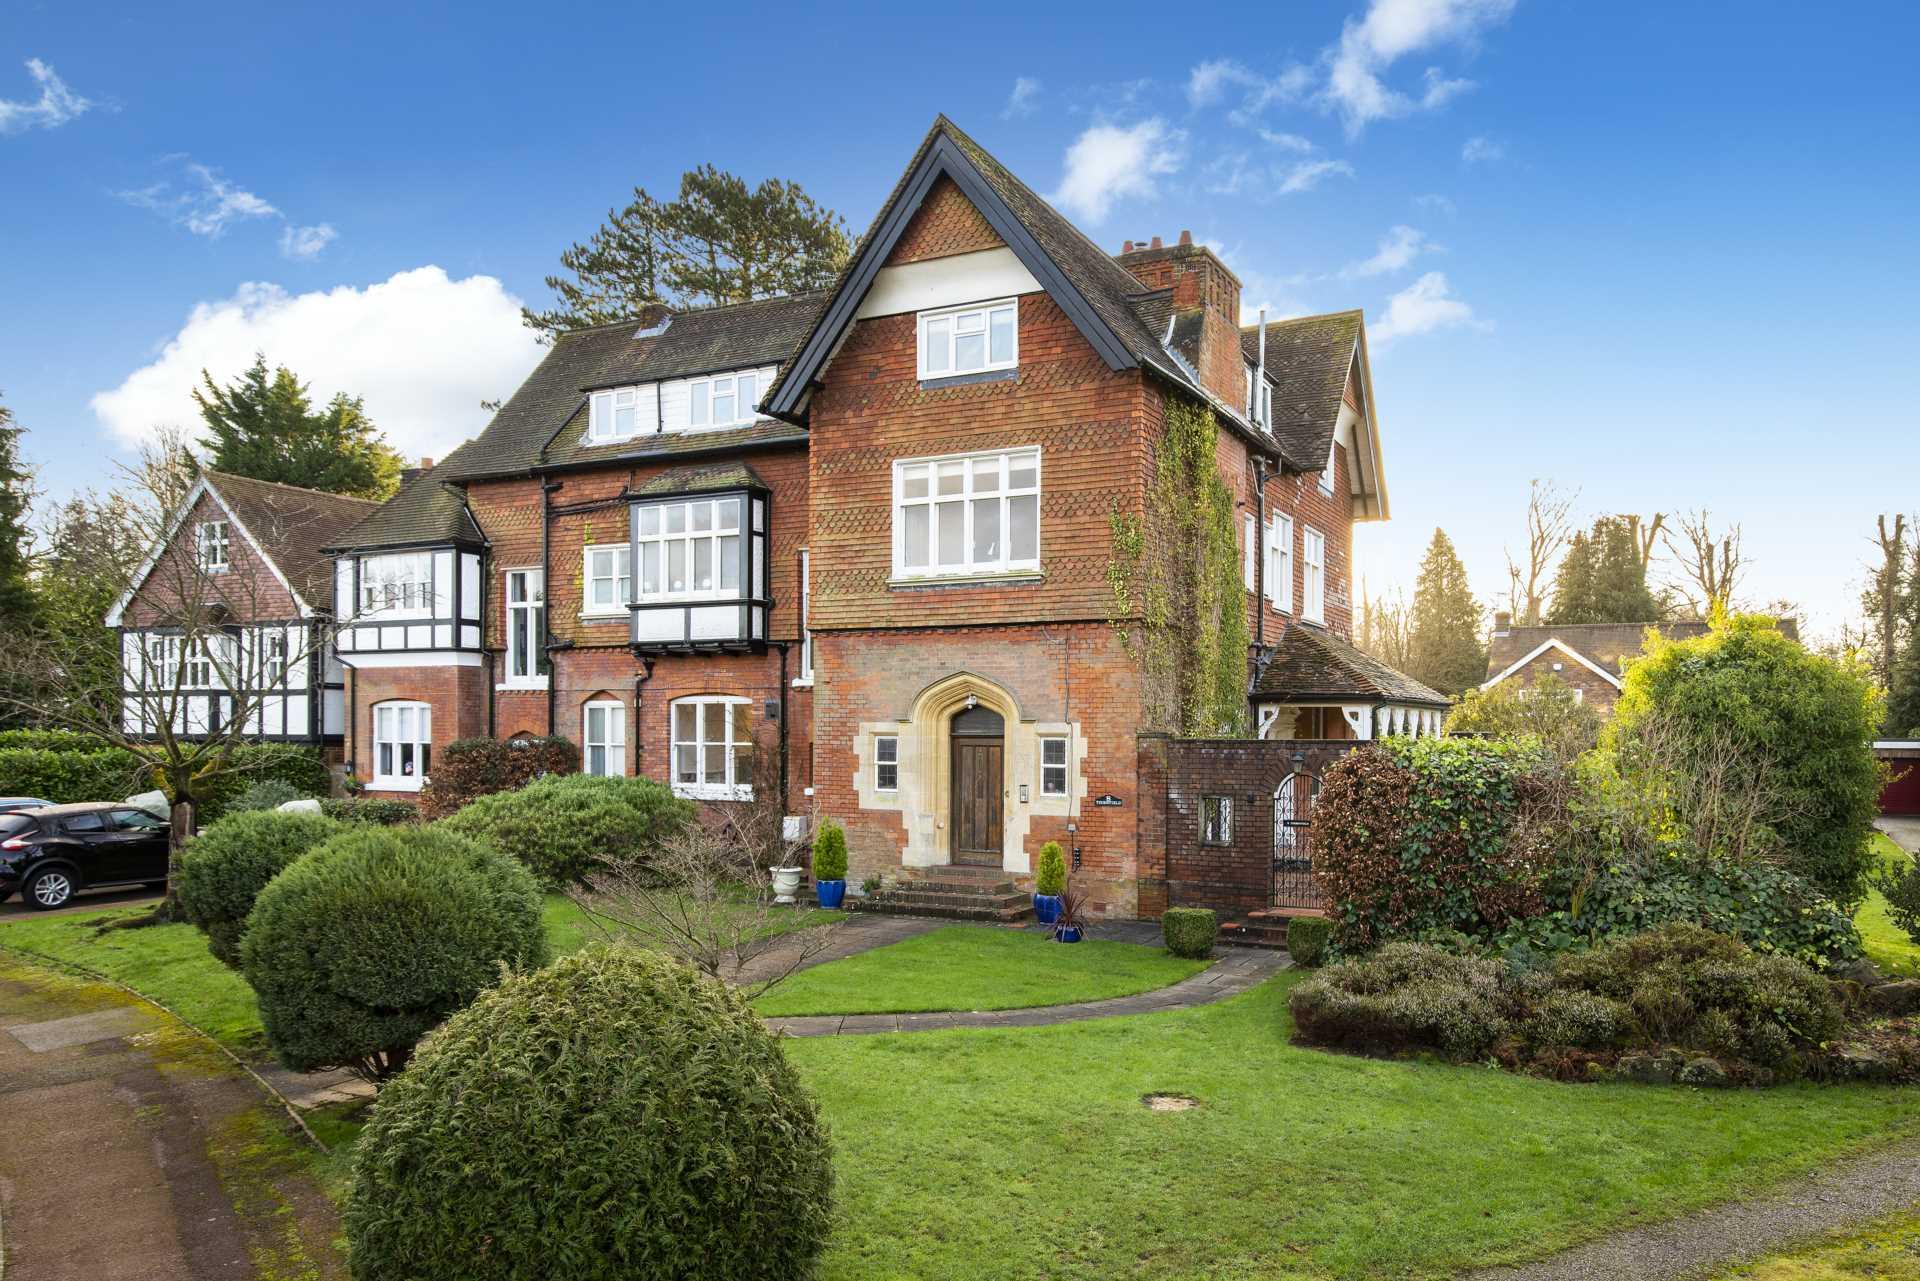 Thornfield Gardens, Tunbridge Wells, Image 1